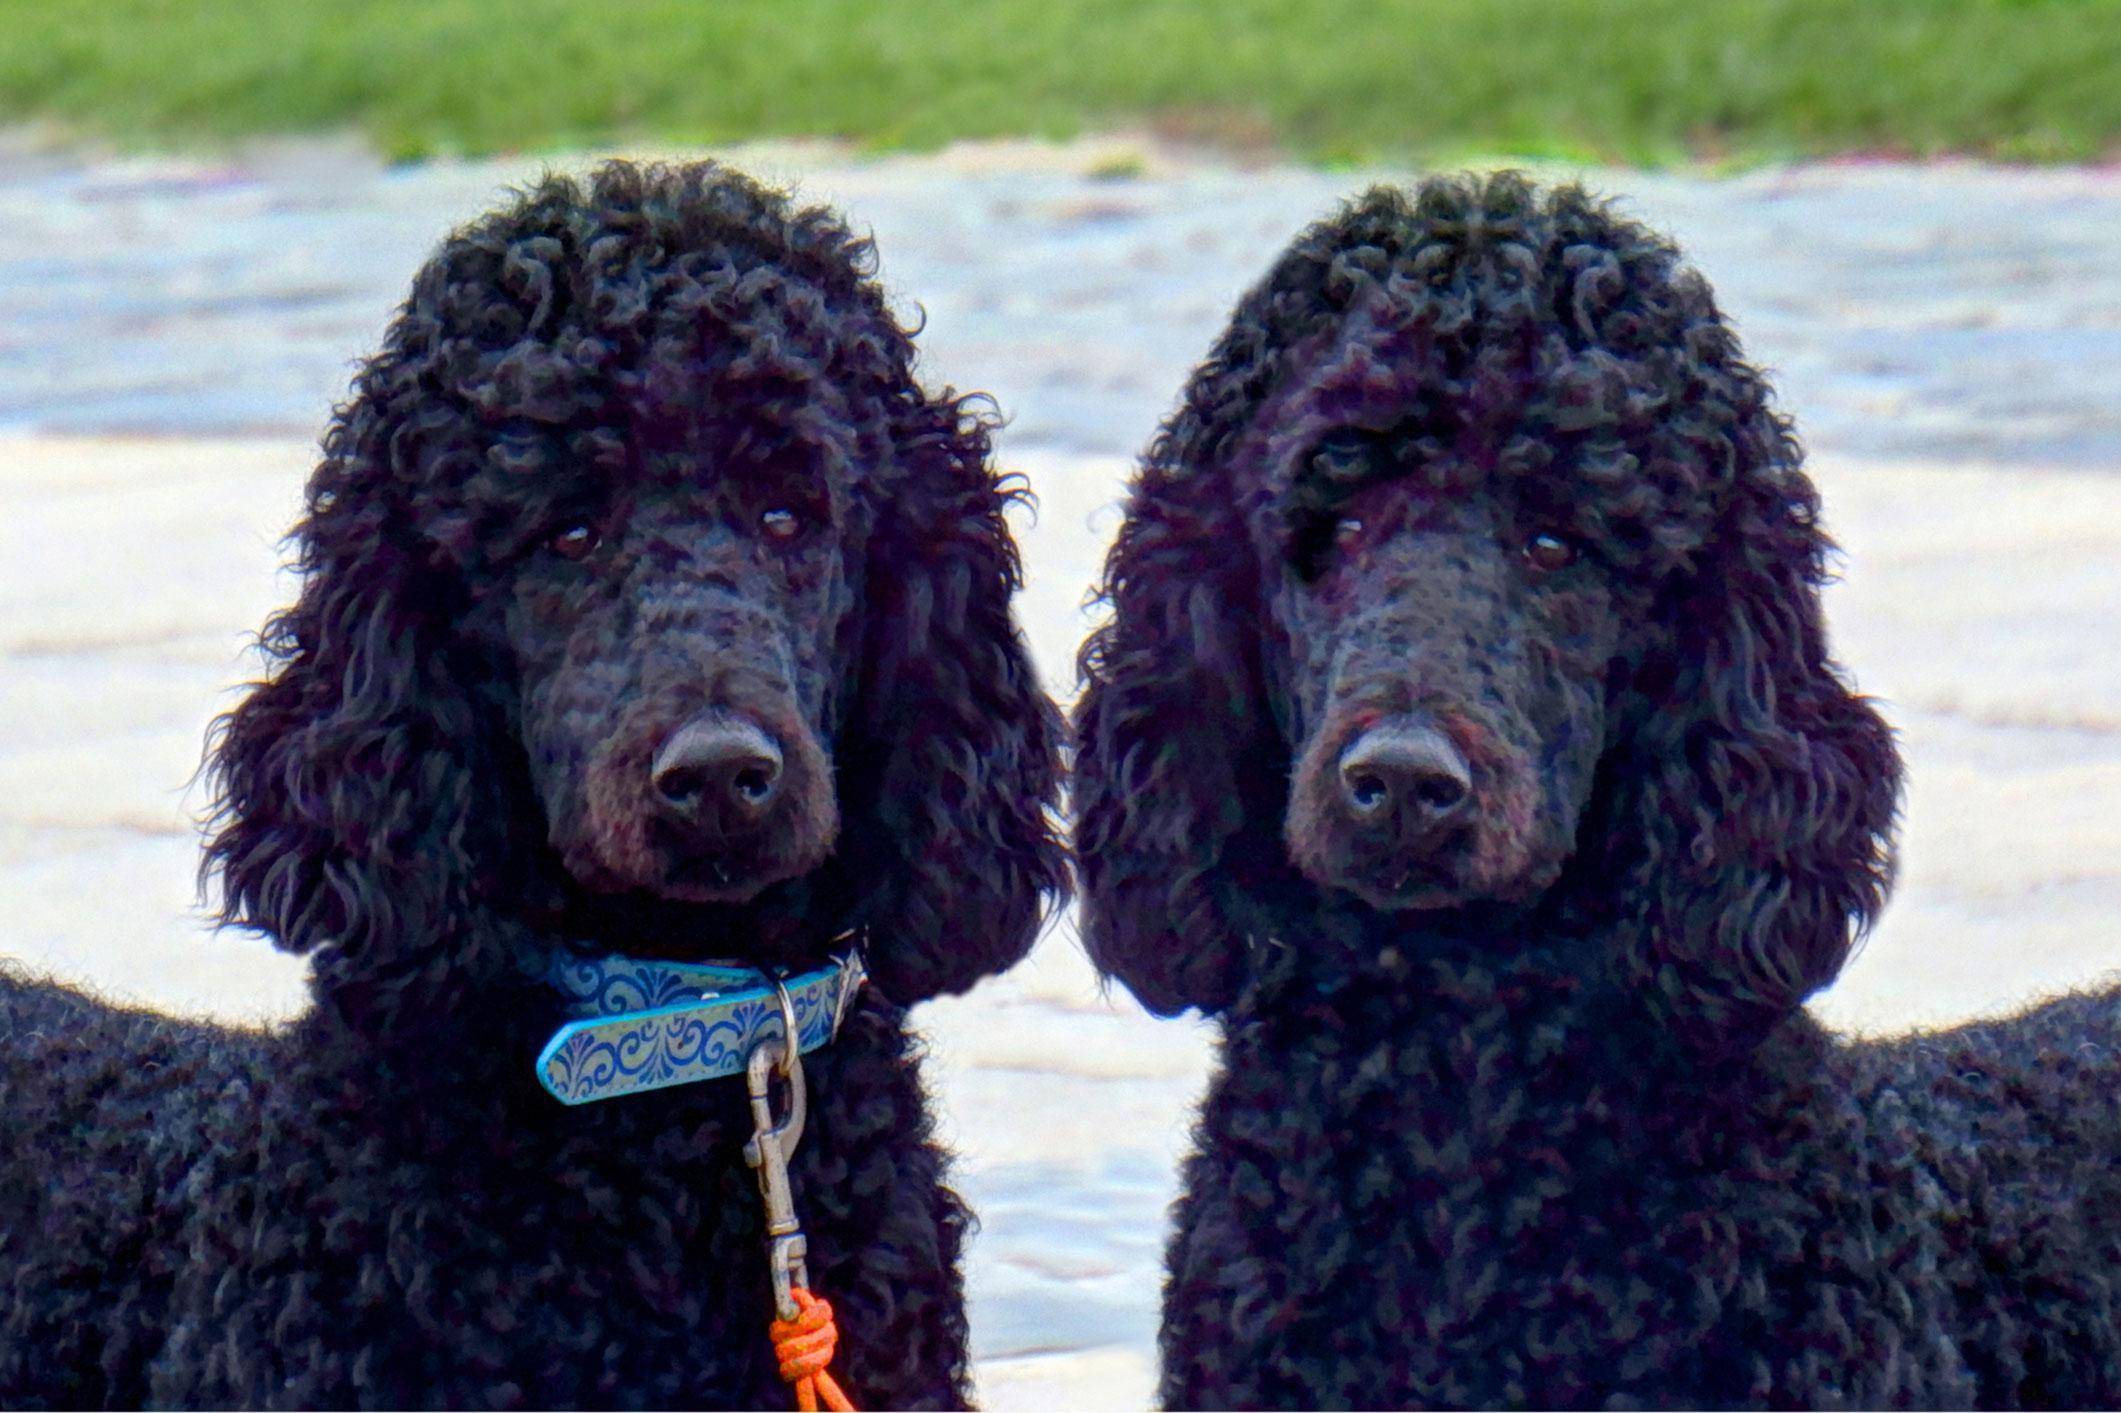 Standard Poodle Adoption | LoveToKnow